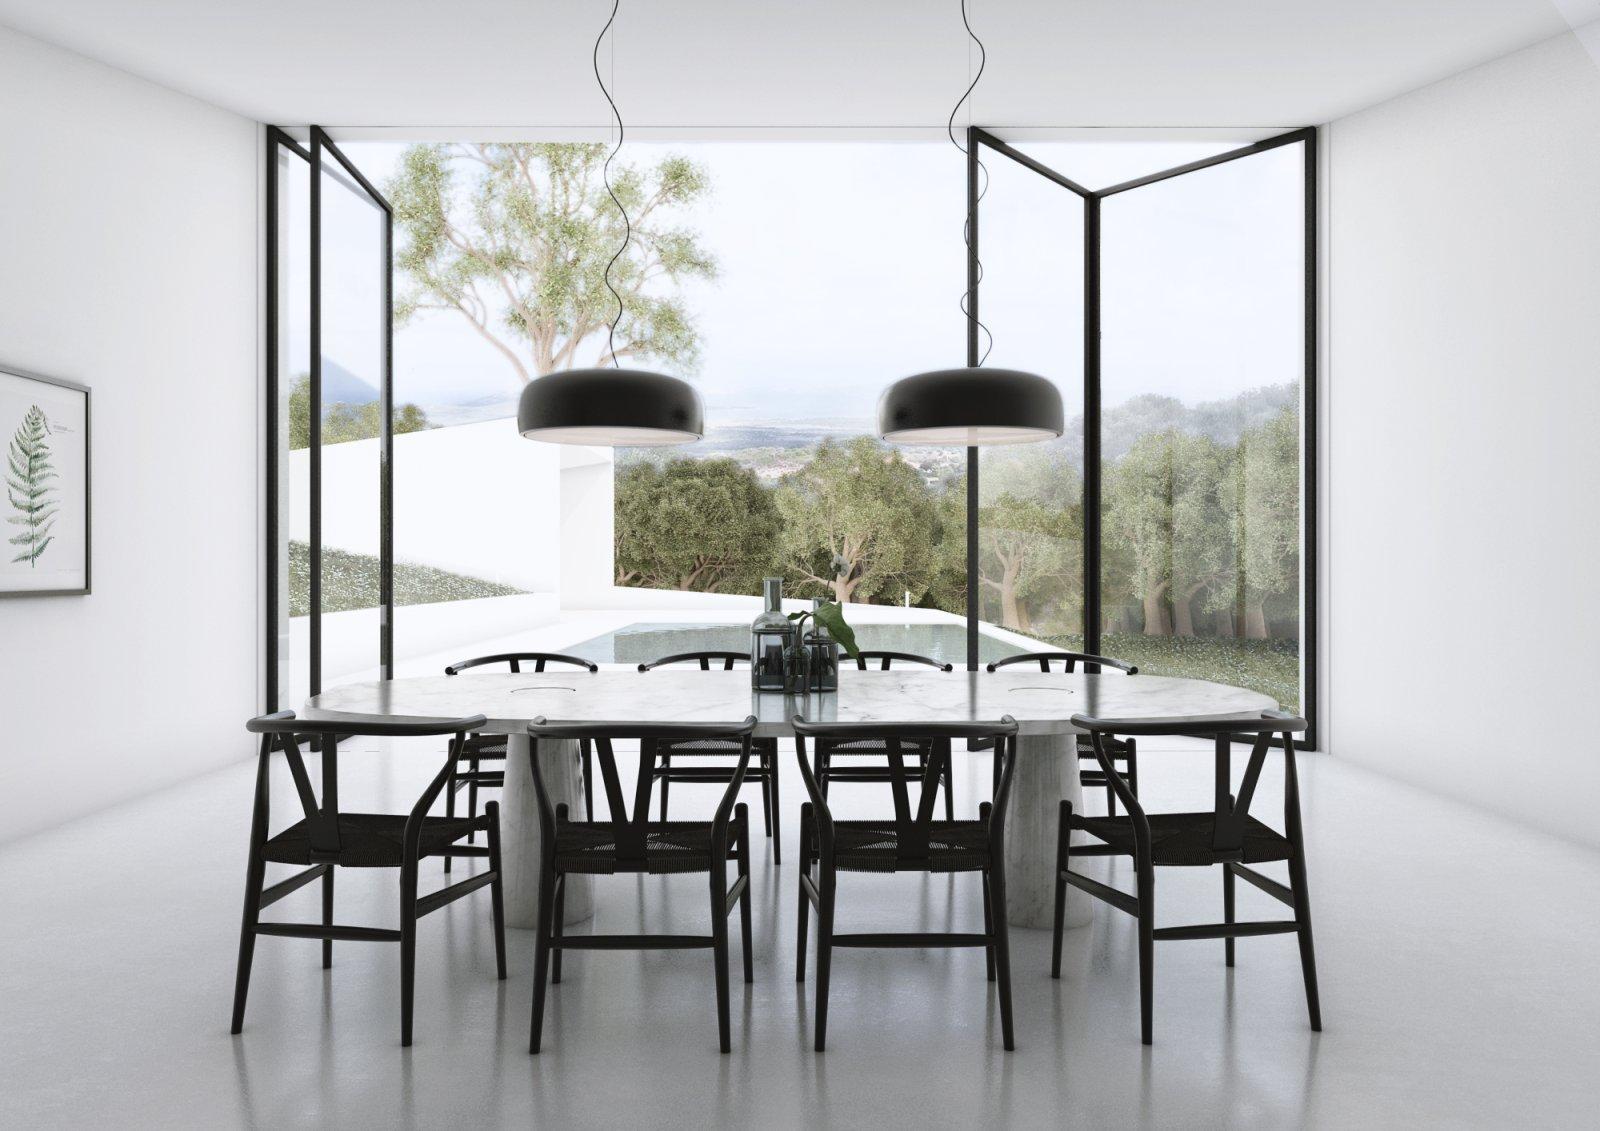 Architettura And Design house-in-sardinia-by-zupelli-design-architettura-12